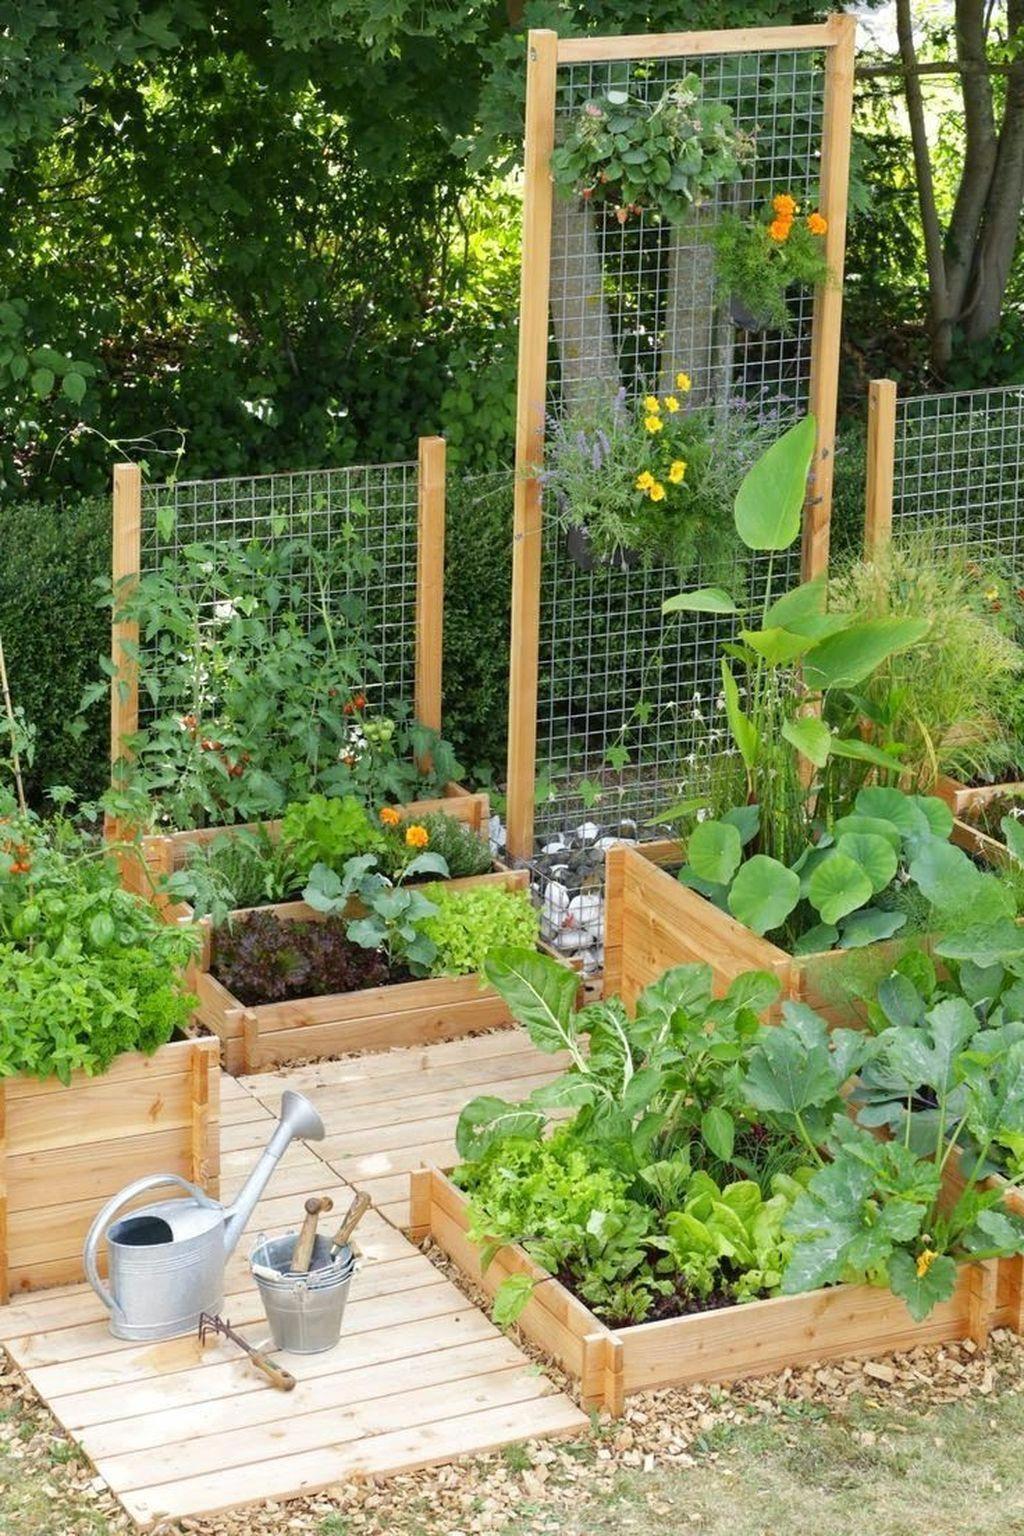 Garden Design Ideas For Small Triangular Gardens #Gardendesignideas | Small Garden Design, Backyard Landscaping, Backyard Vegetable Gardens